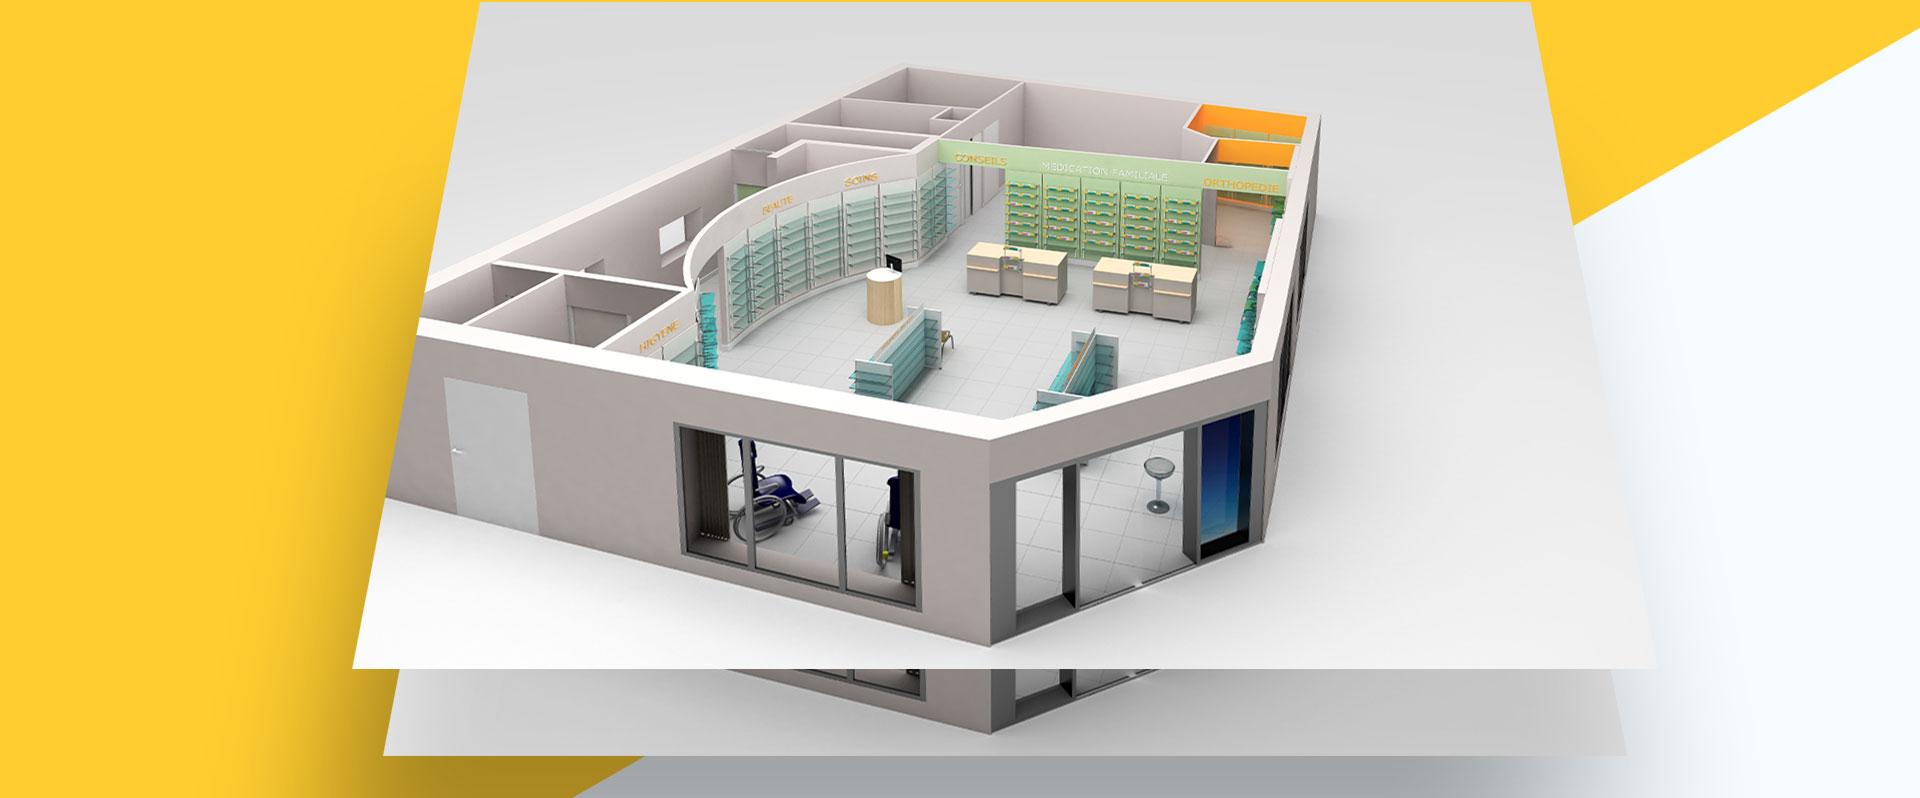 plan de masse de pharmacie en 3d